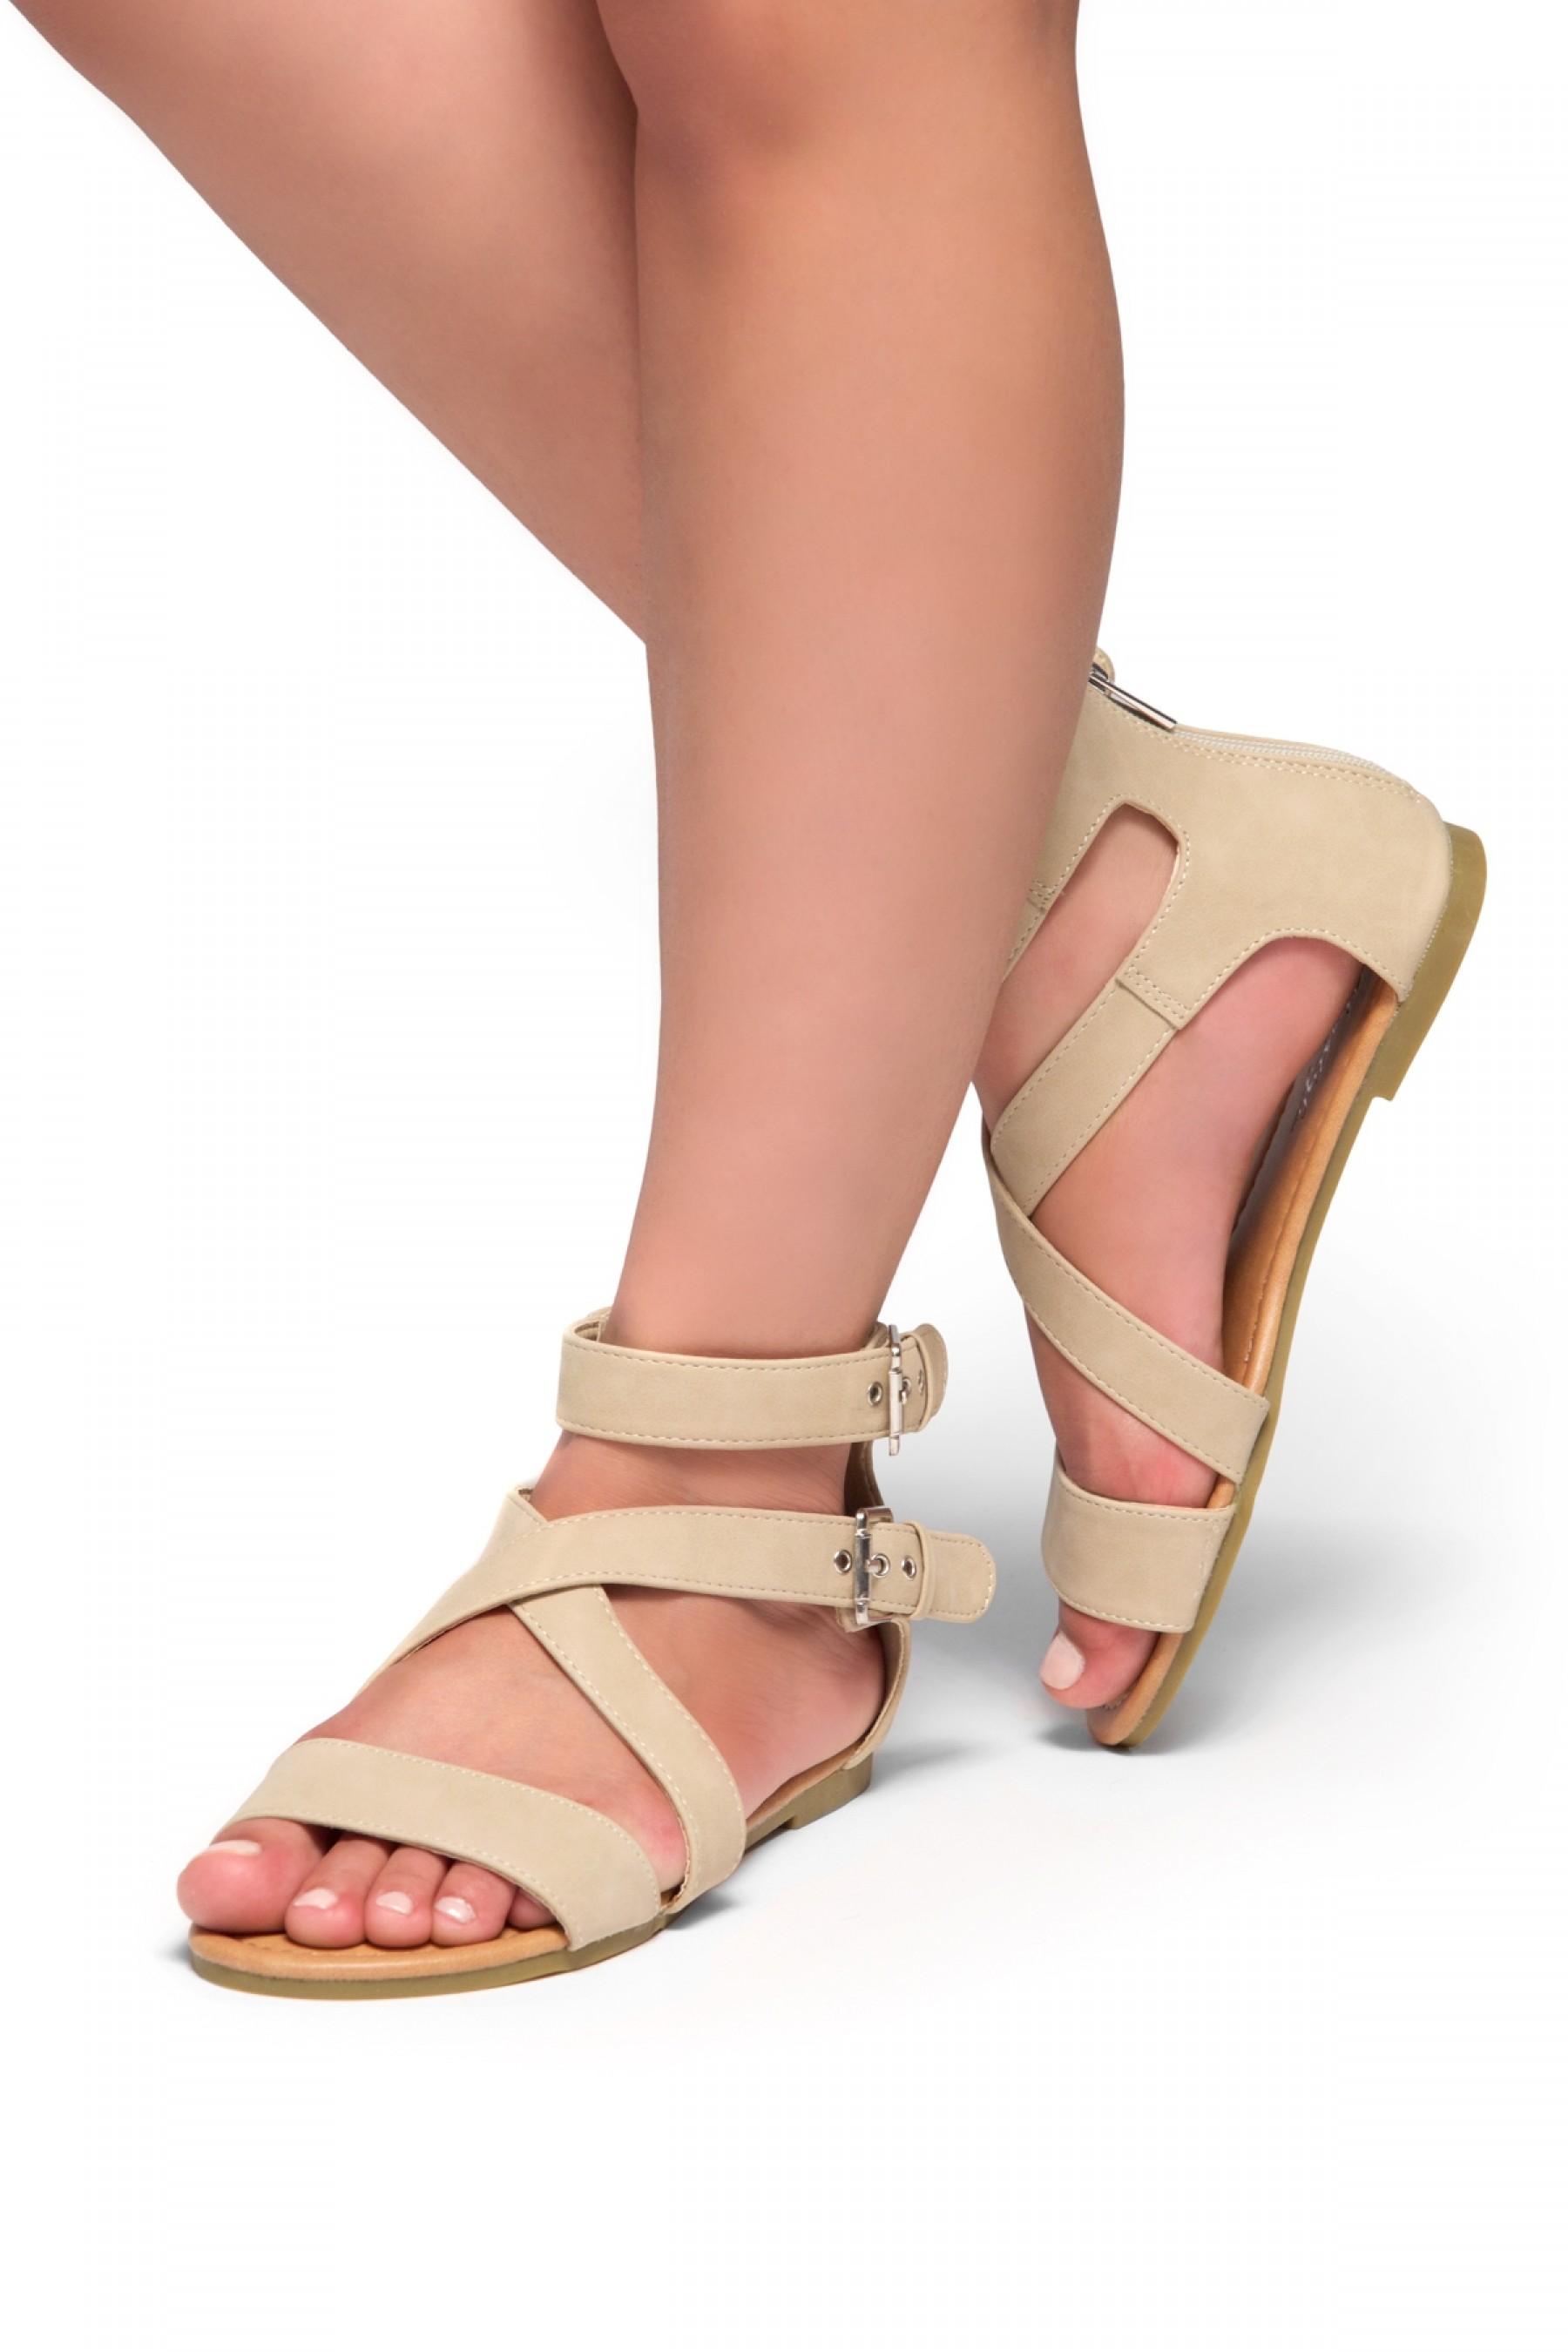 HerStyle Fidela Buckled Strappy Gladiator Flat Sandal (Beige)